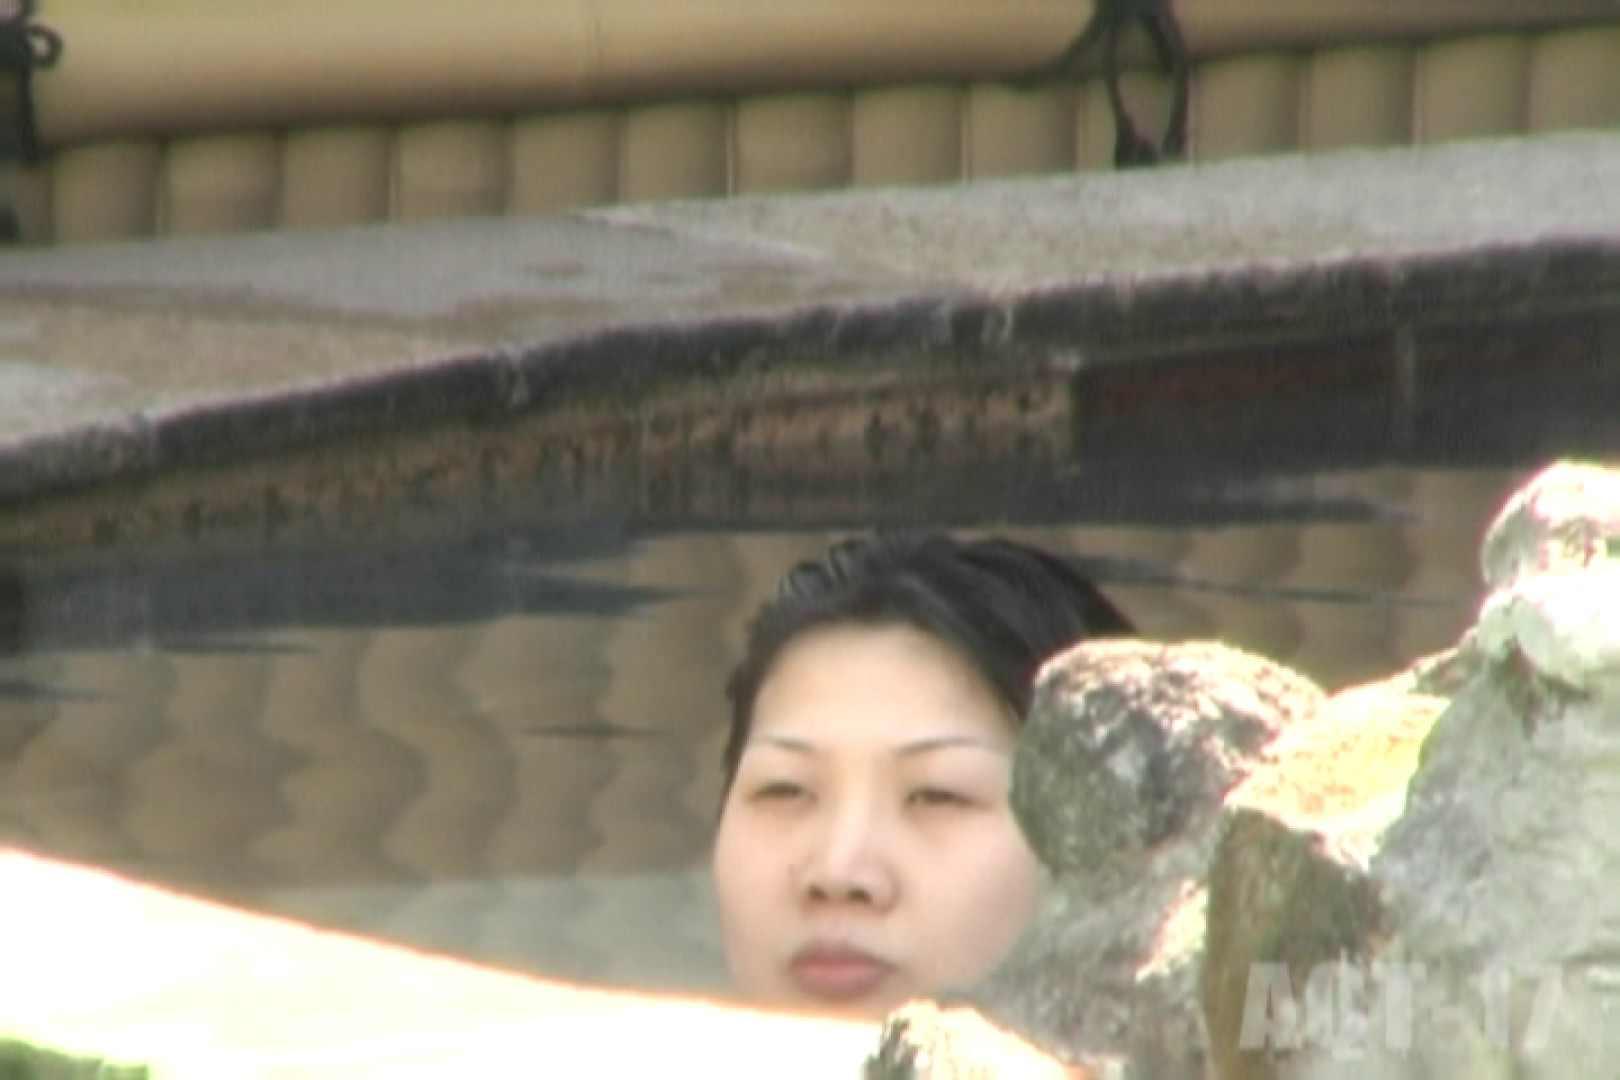 Aquaな露天風呂Vol.850 露天風呂突入 | 盗撮師作品  73pic 25